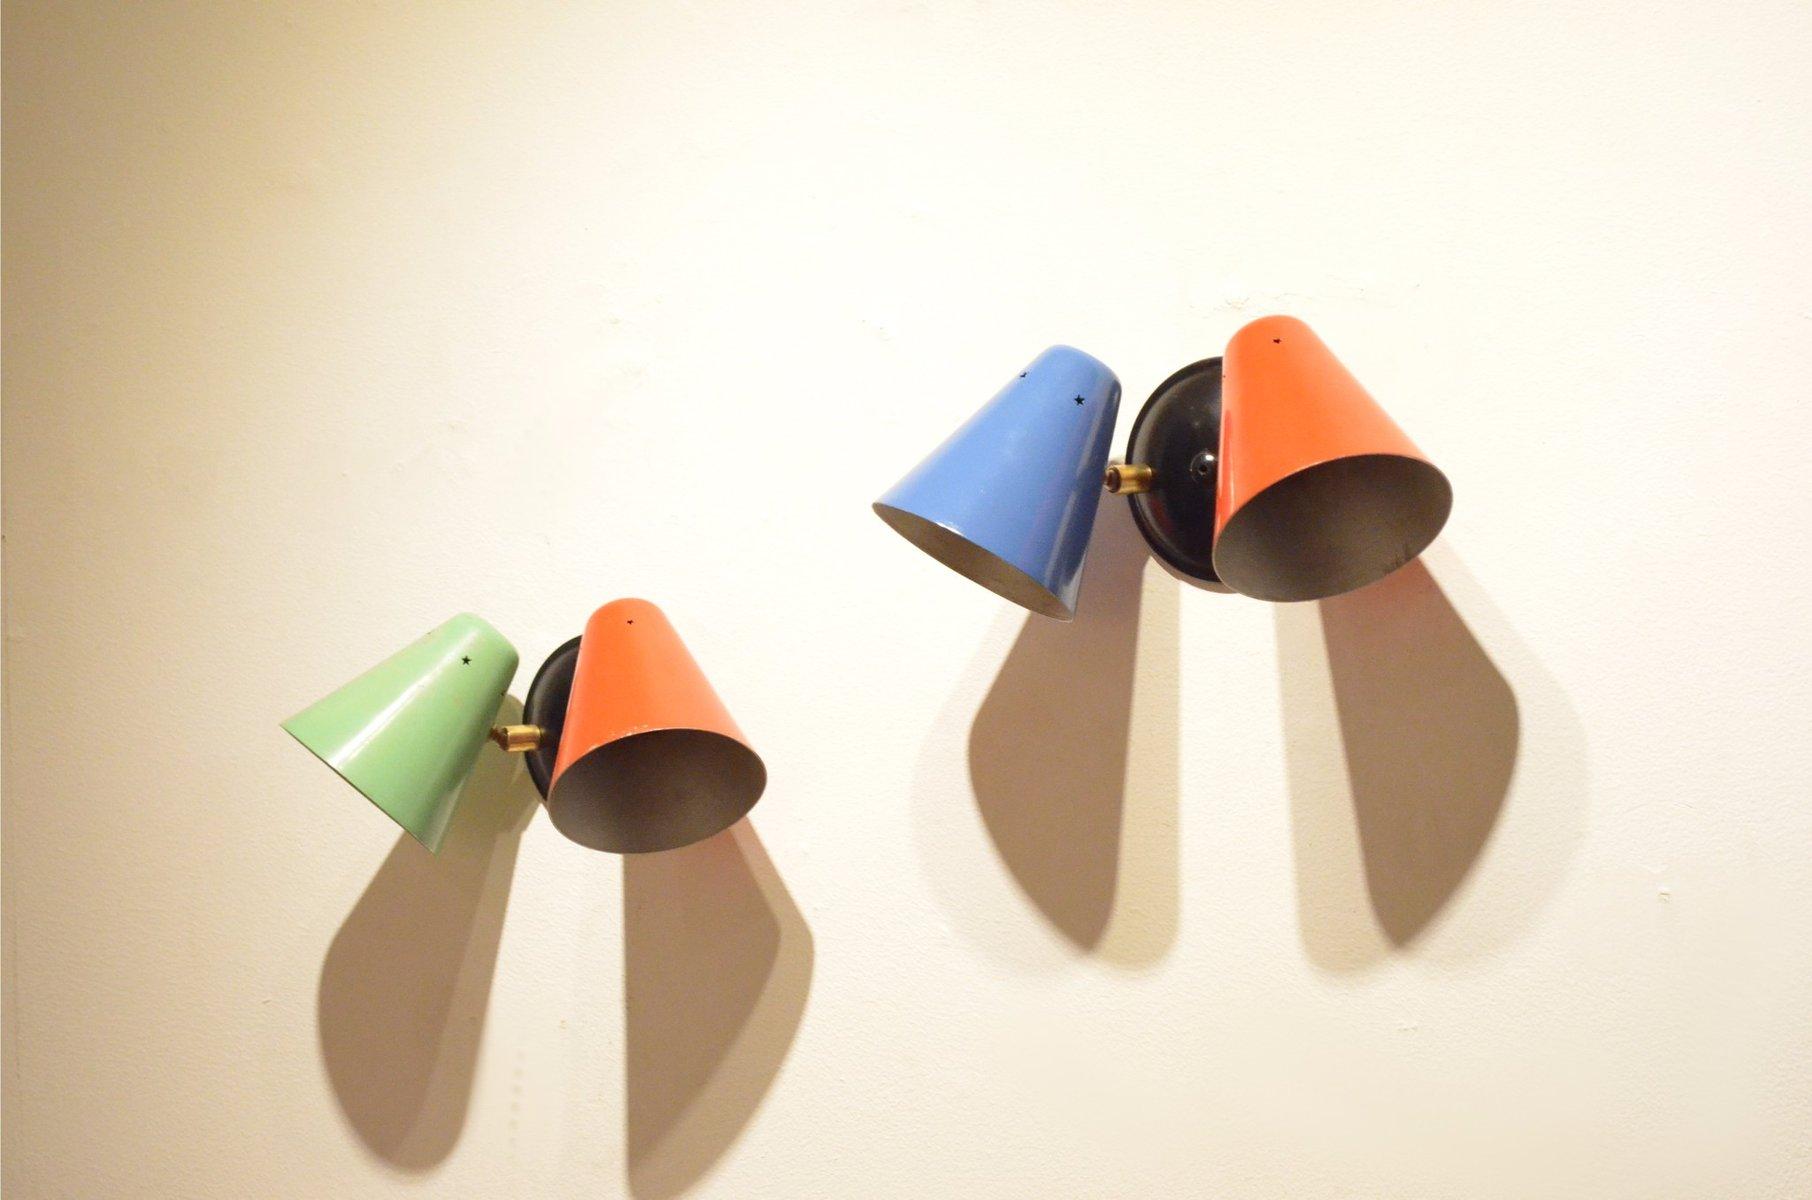 Verstellbare Bunte Kegelförmige Wandleuchten, 2er Set